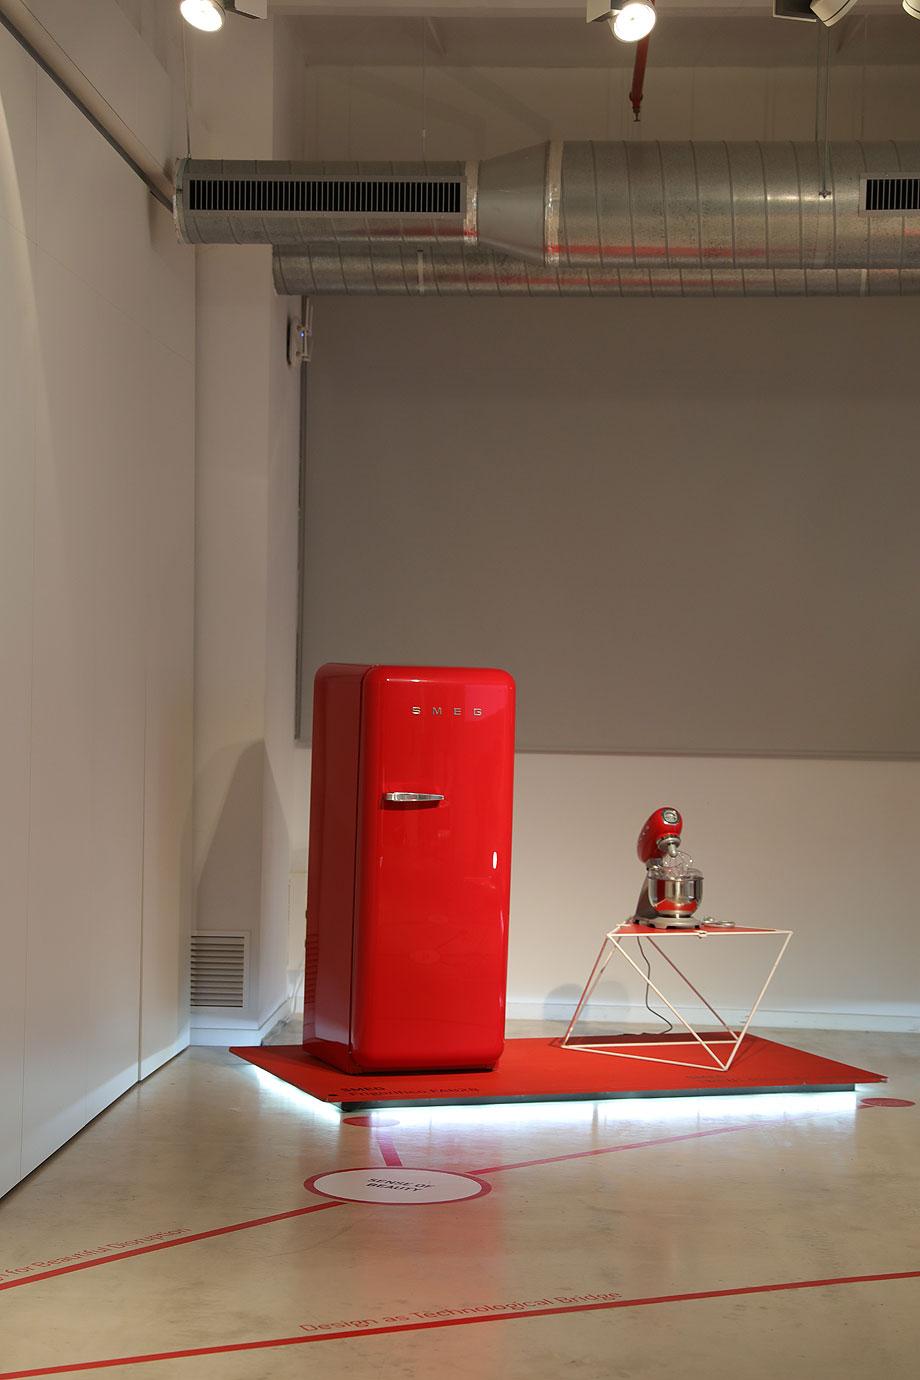 exposicion-exemplar-diseño-italiano-ied-barcelona (2)